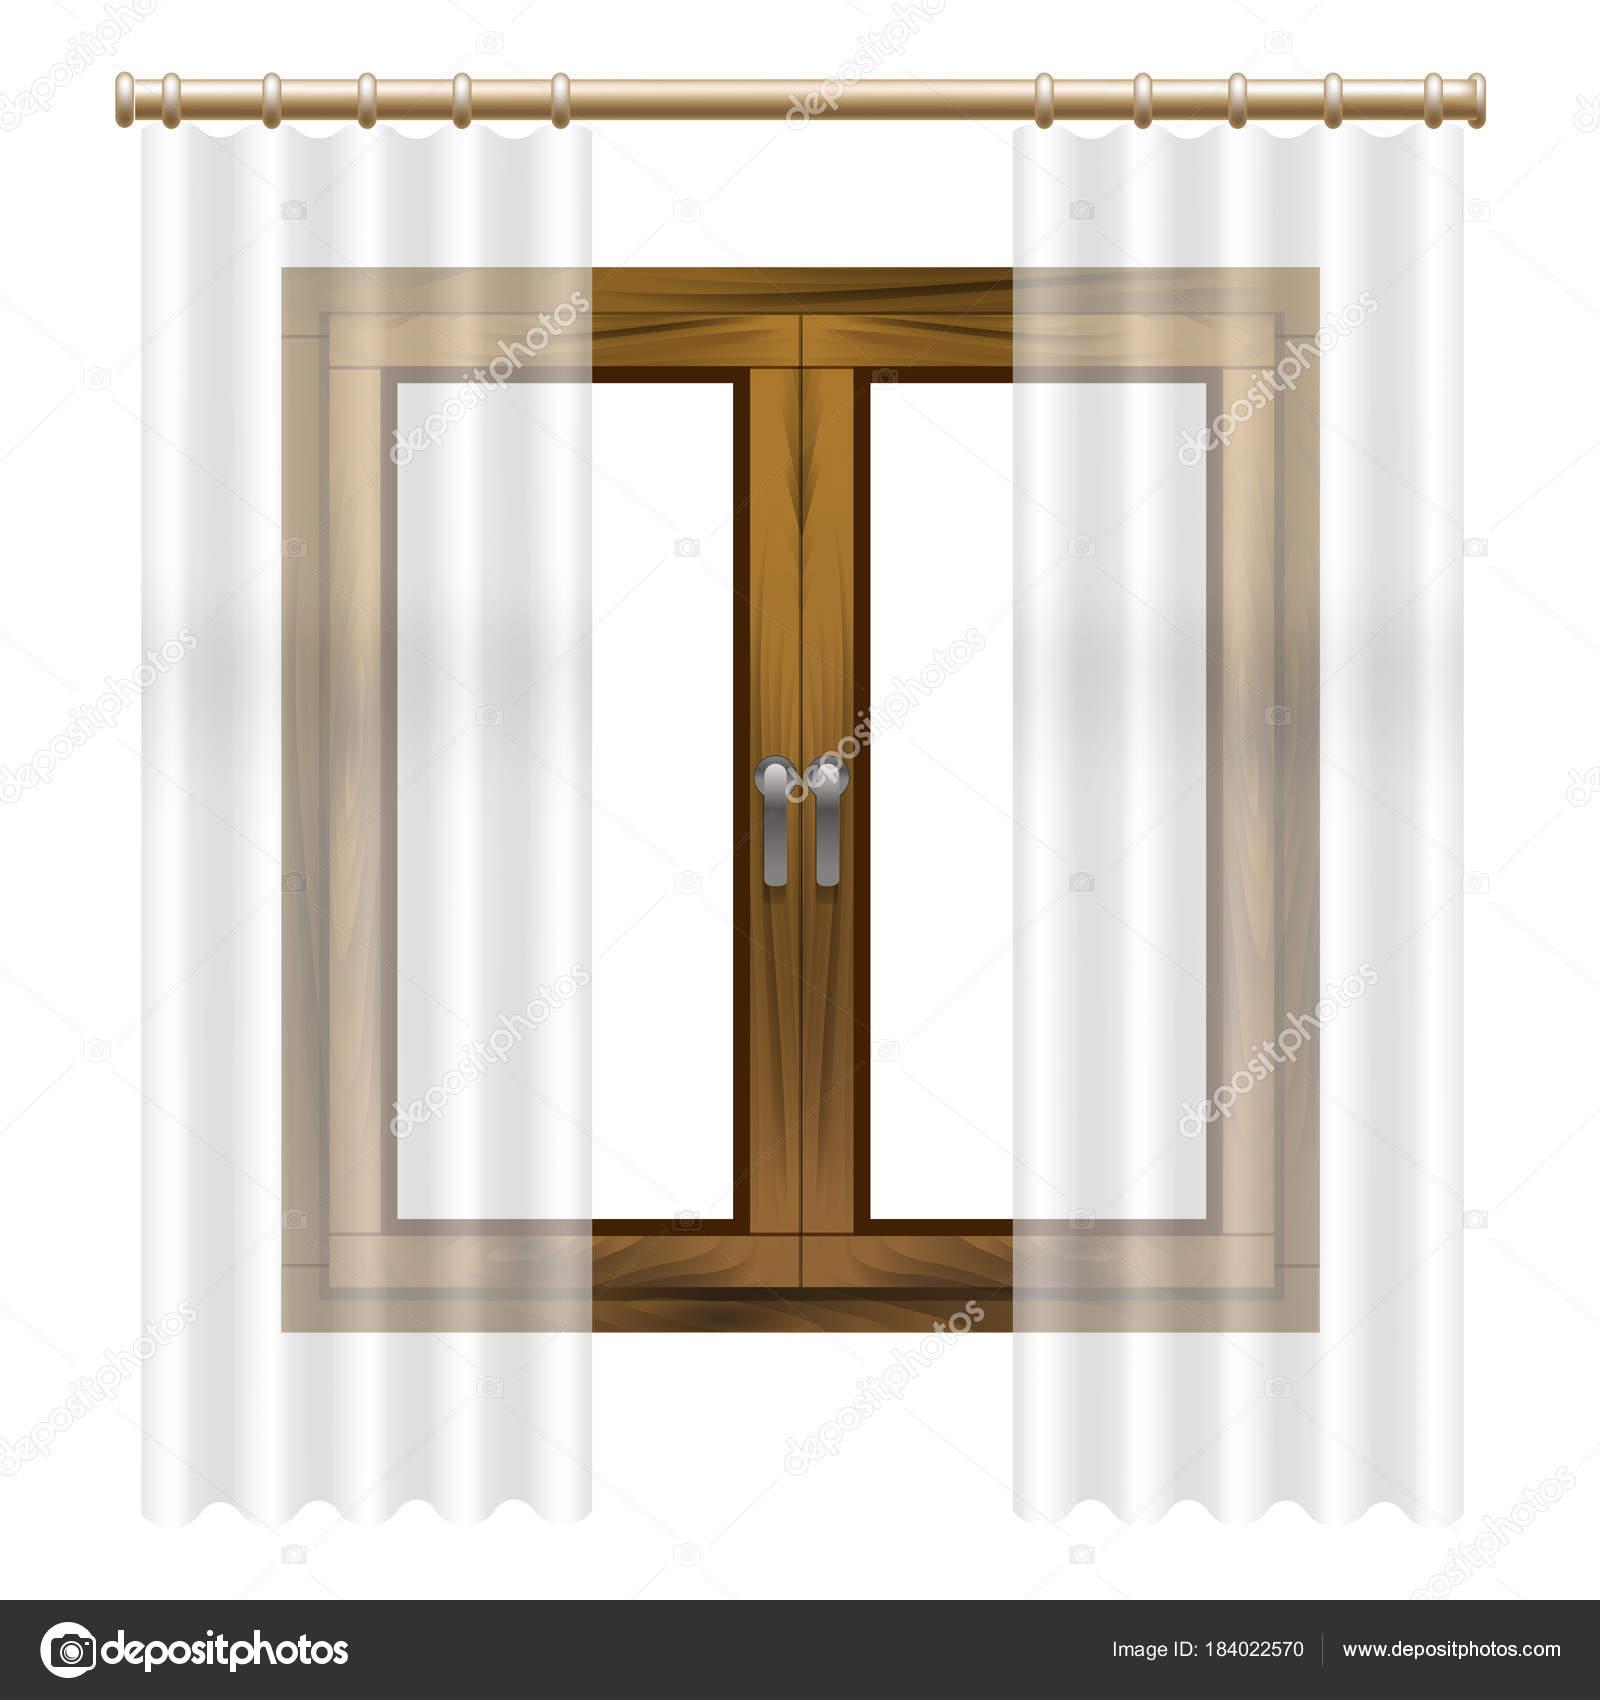 Realista detallada 3d madera marco de la ventana. Vector de ...